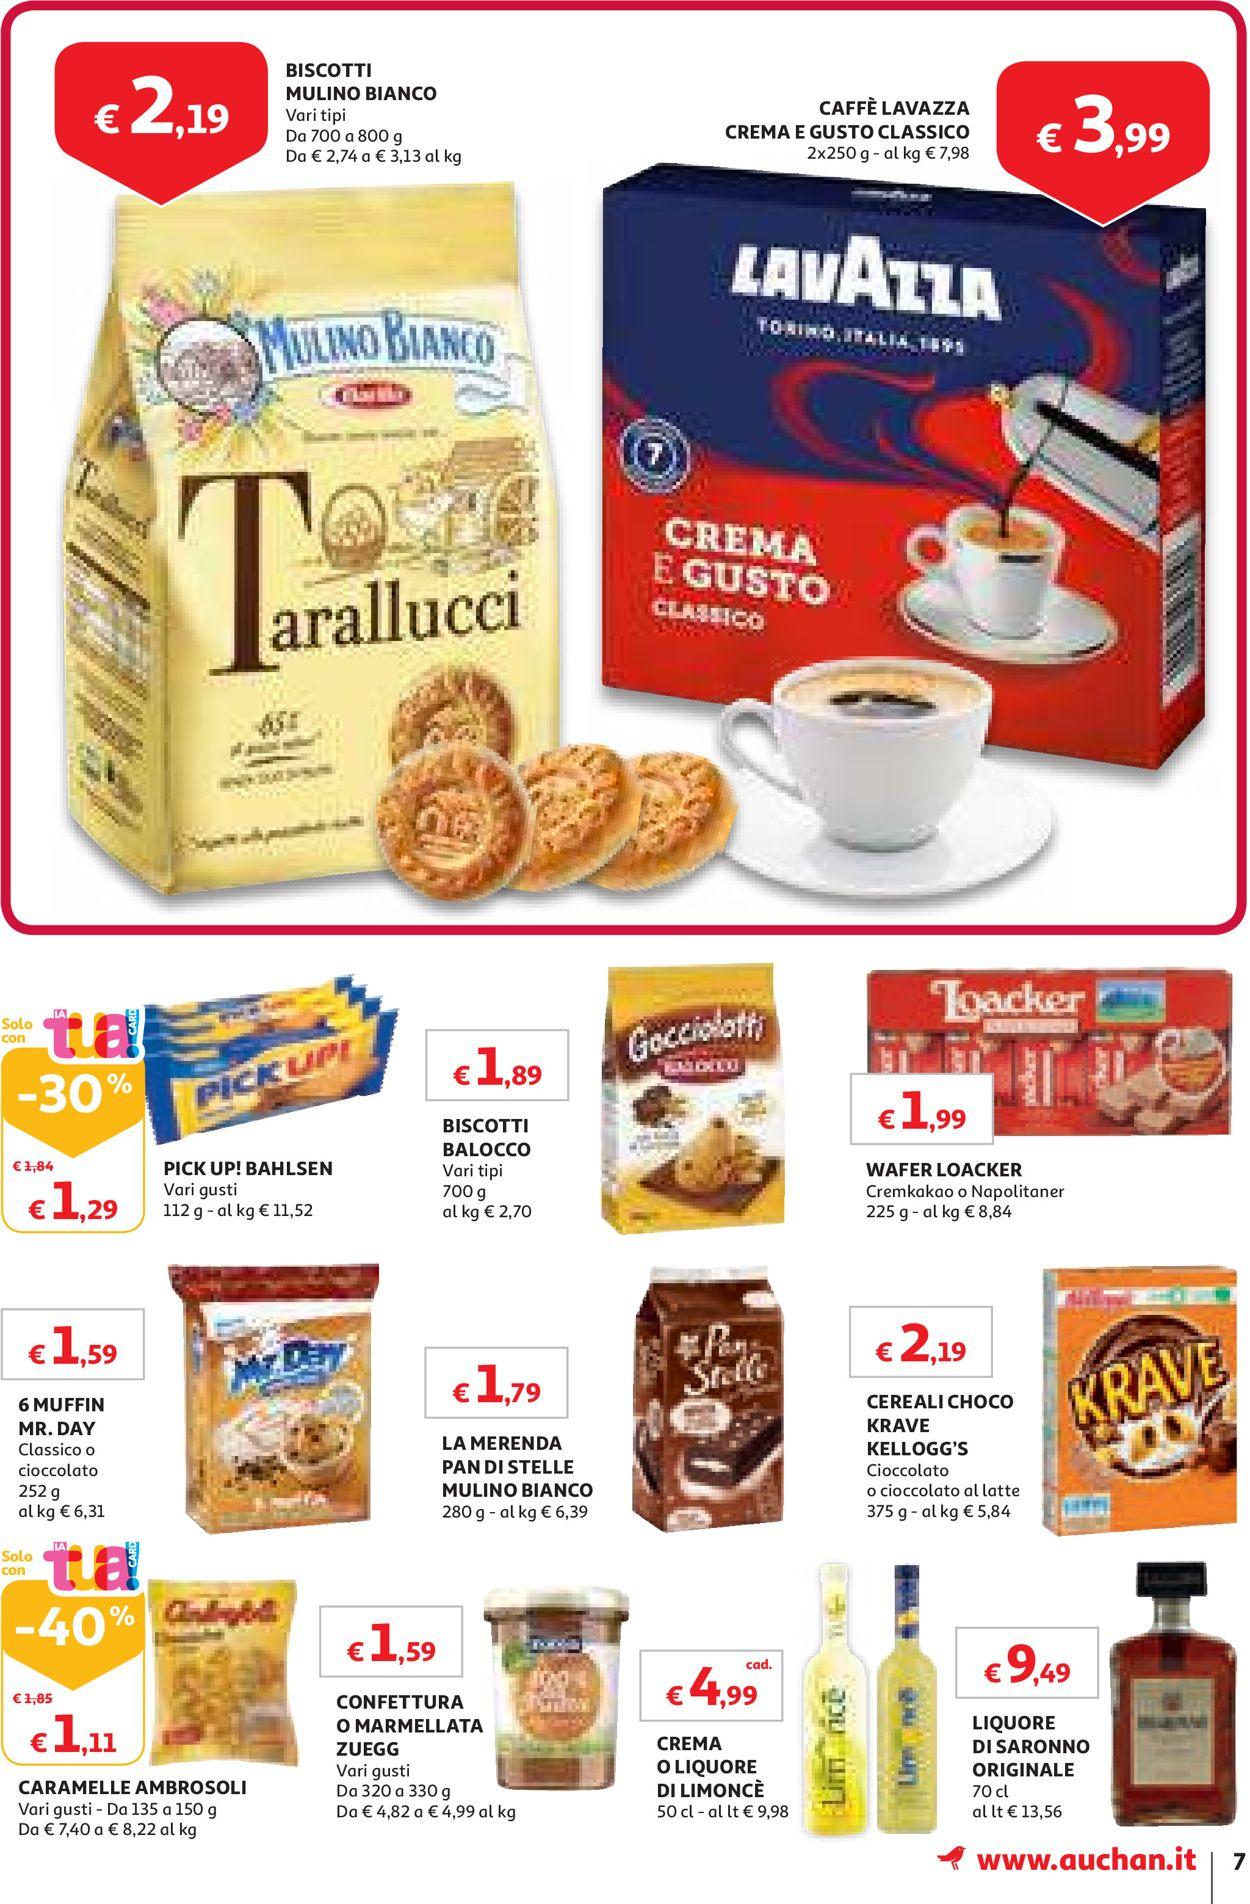 Volantino Auchan - Offerte 20/08-28/08/2019 (Pagina 7)